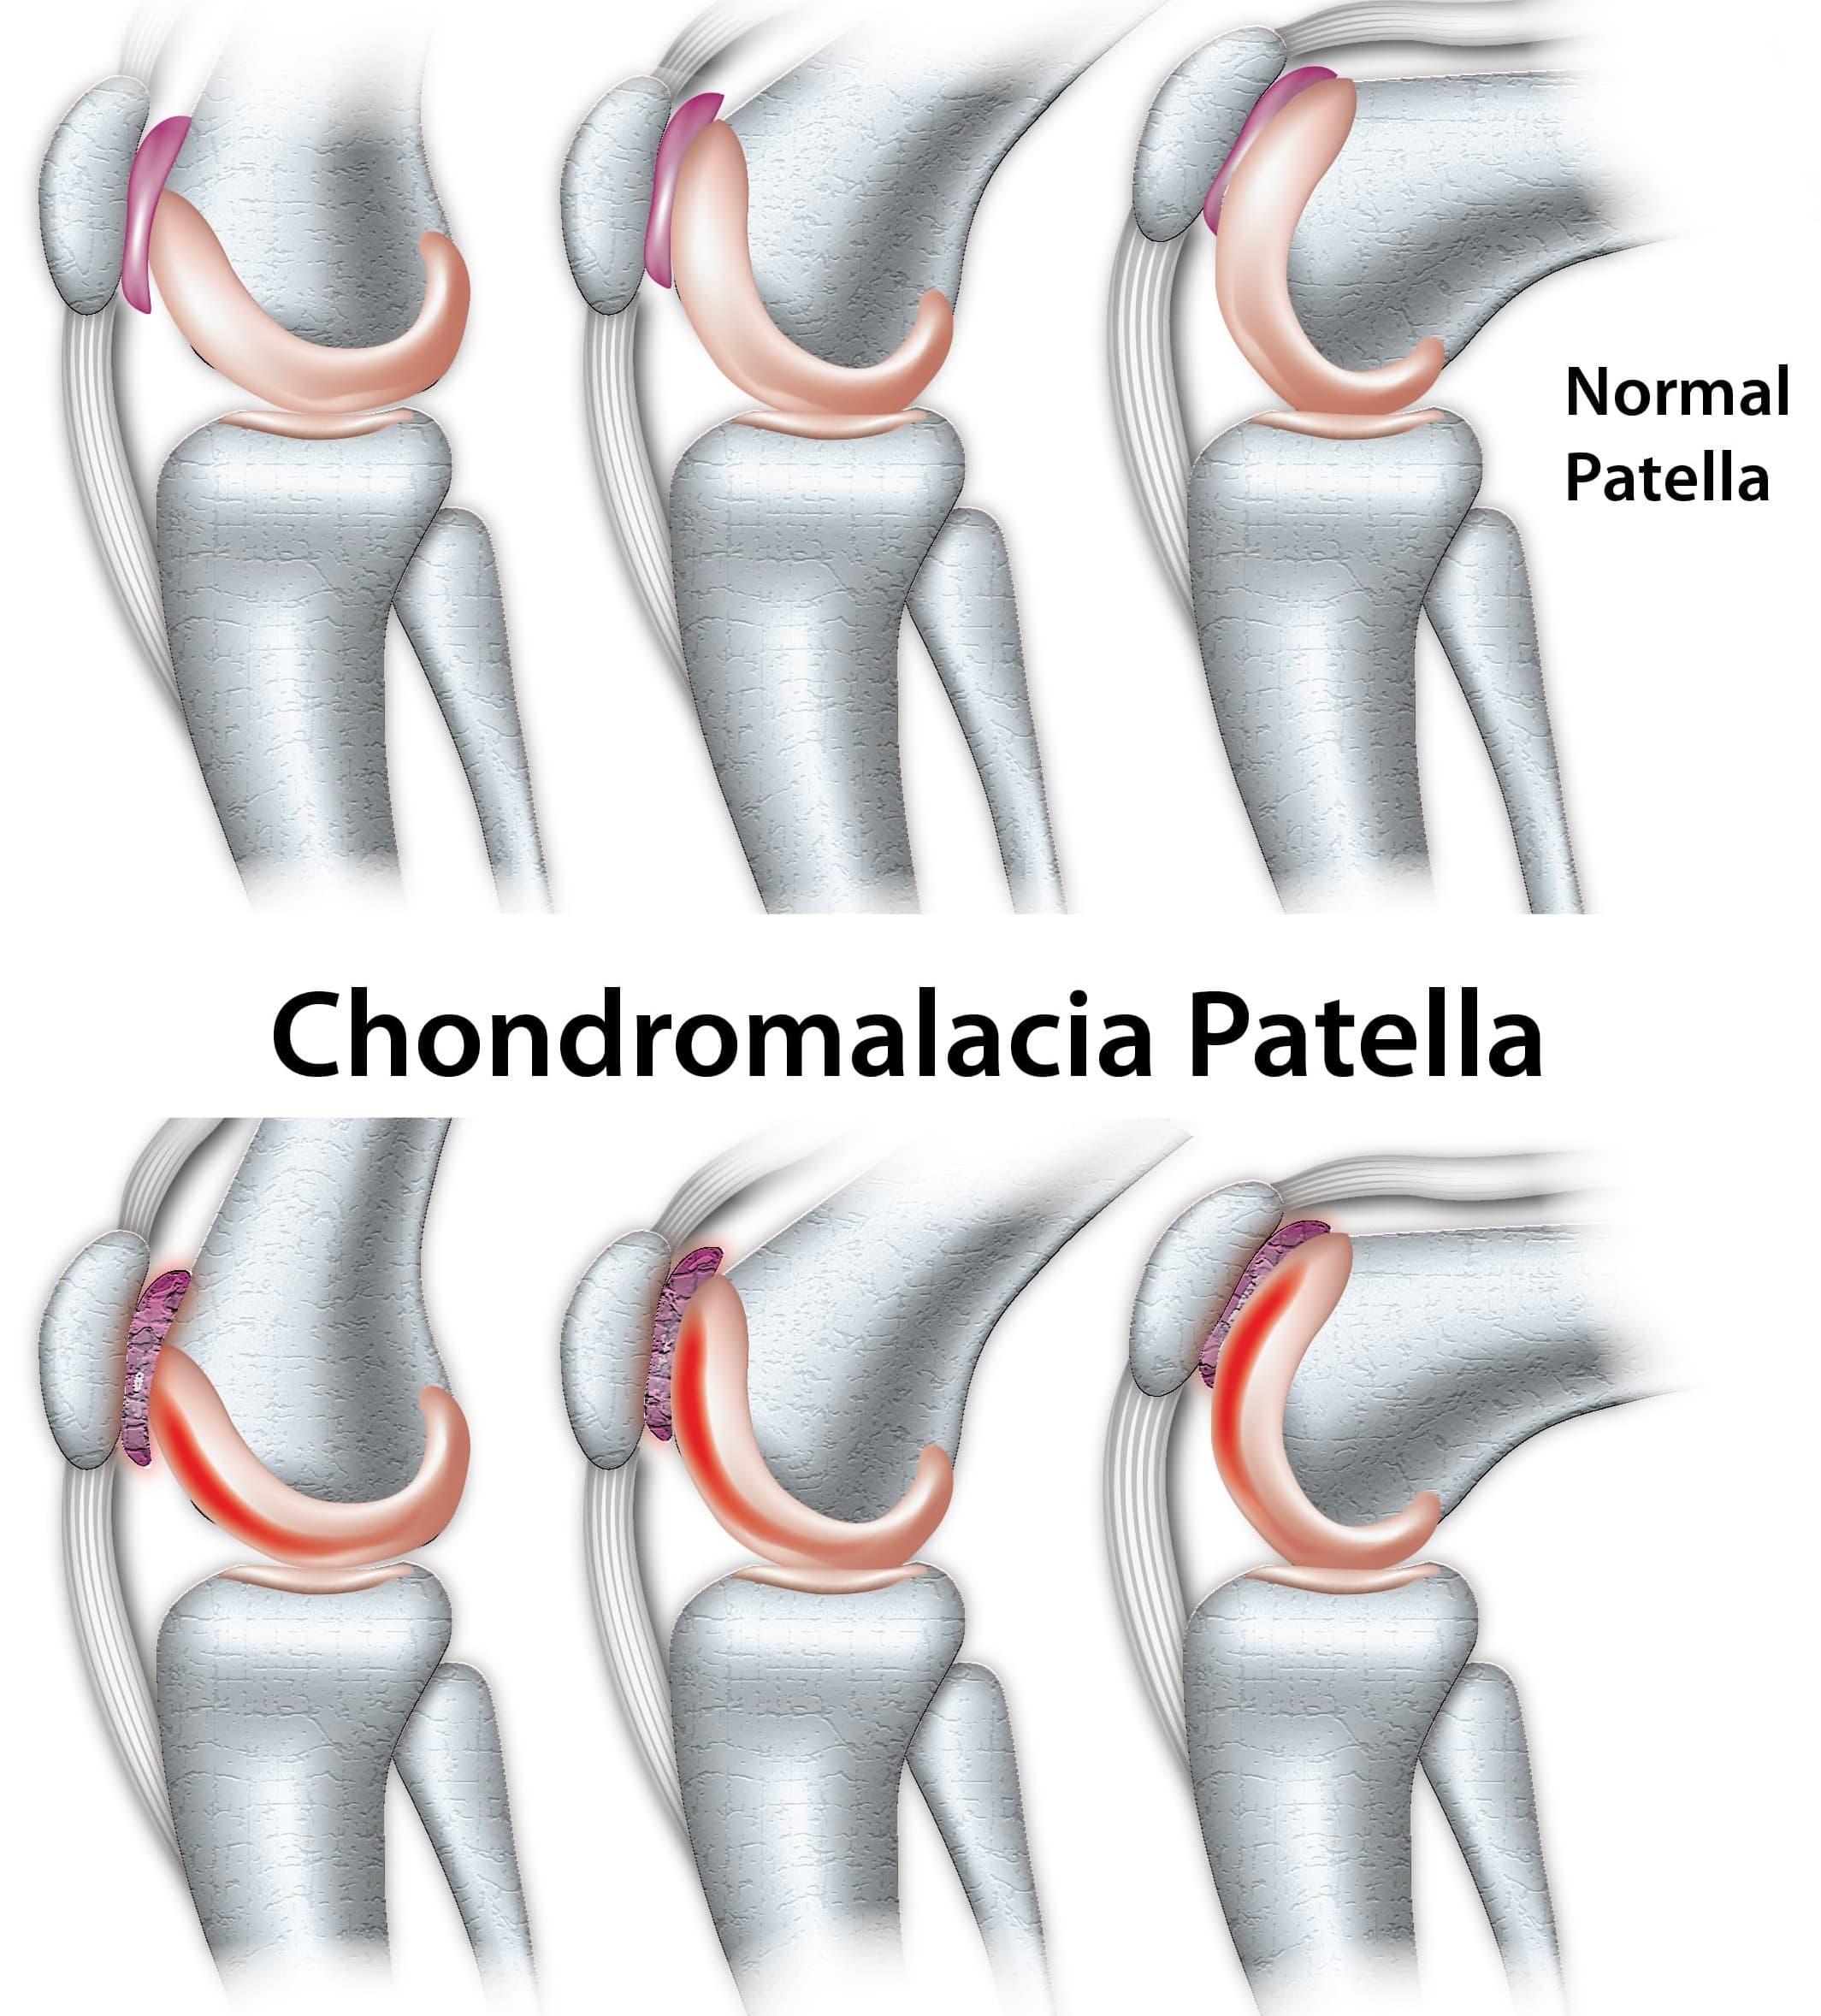 Chondromalacia Patella